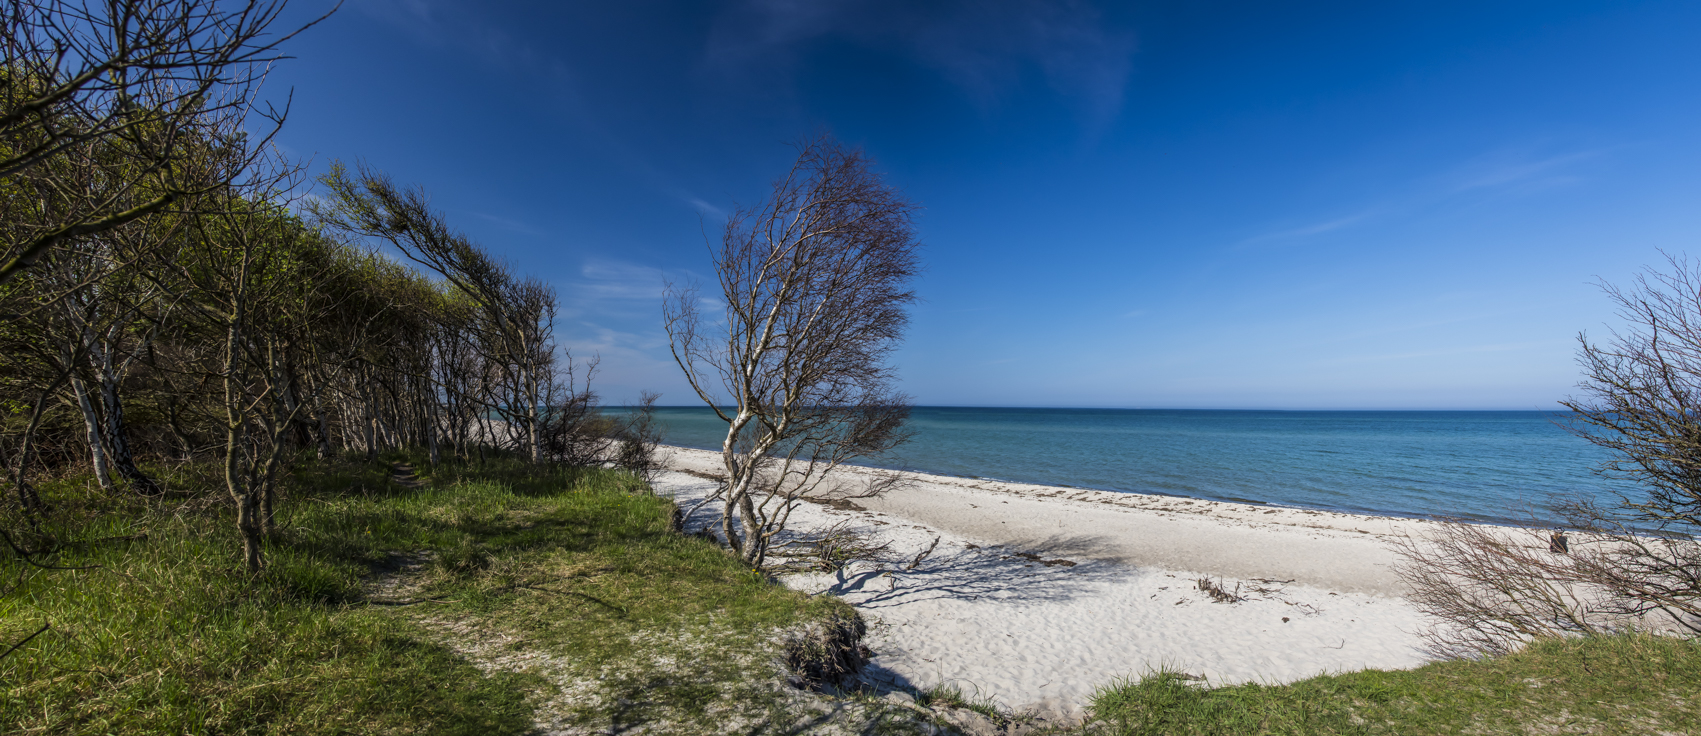 Dünen mit Strand FeWos Del Mar Zingst